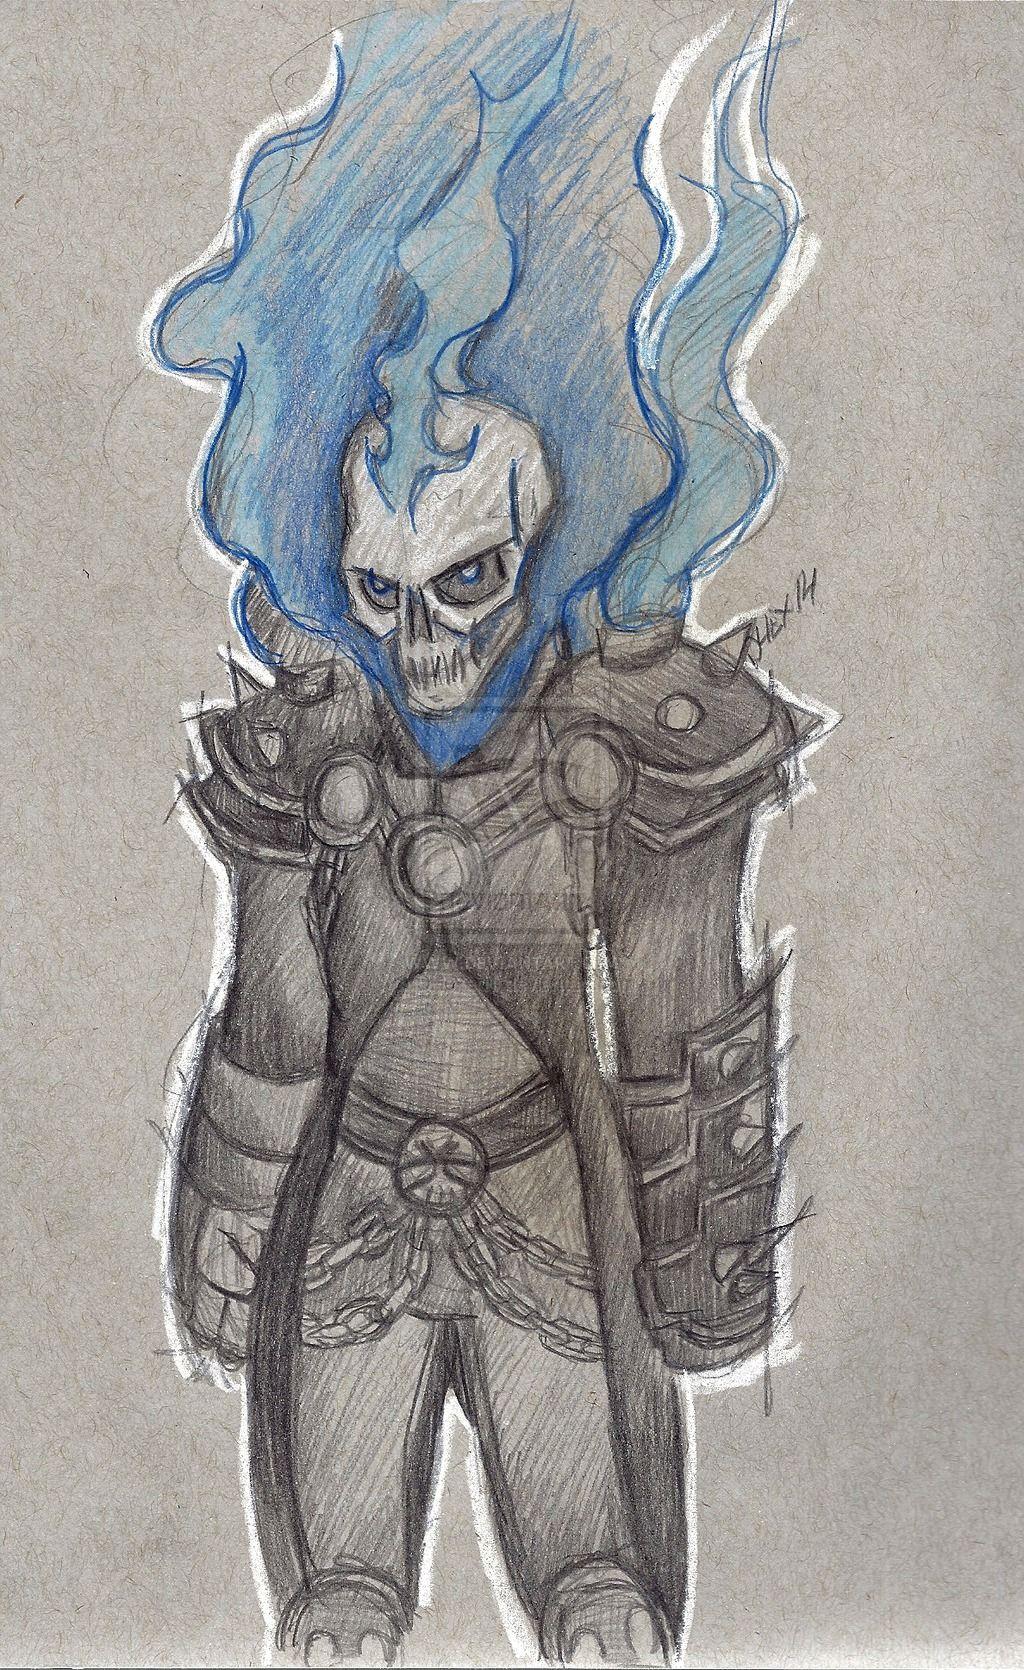 Ghost Rider by DHexedviantart on deviantART Ghost